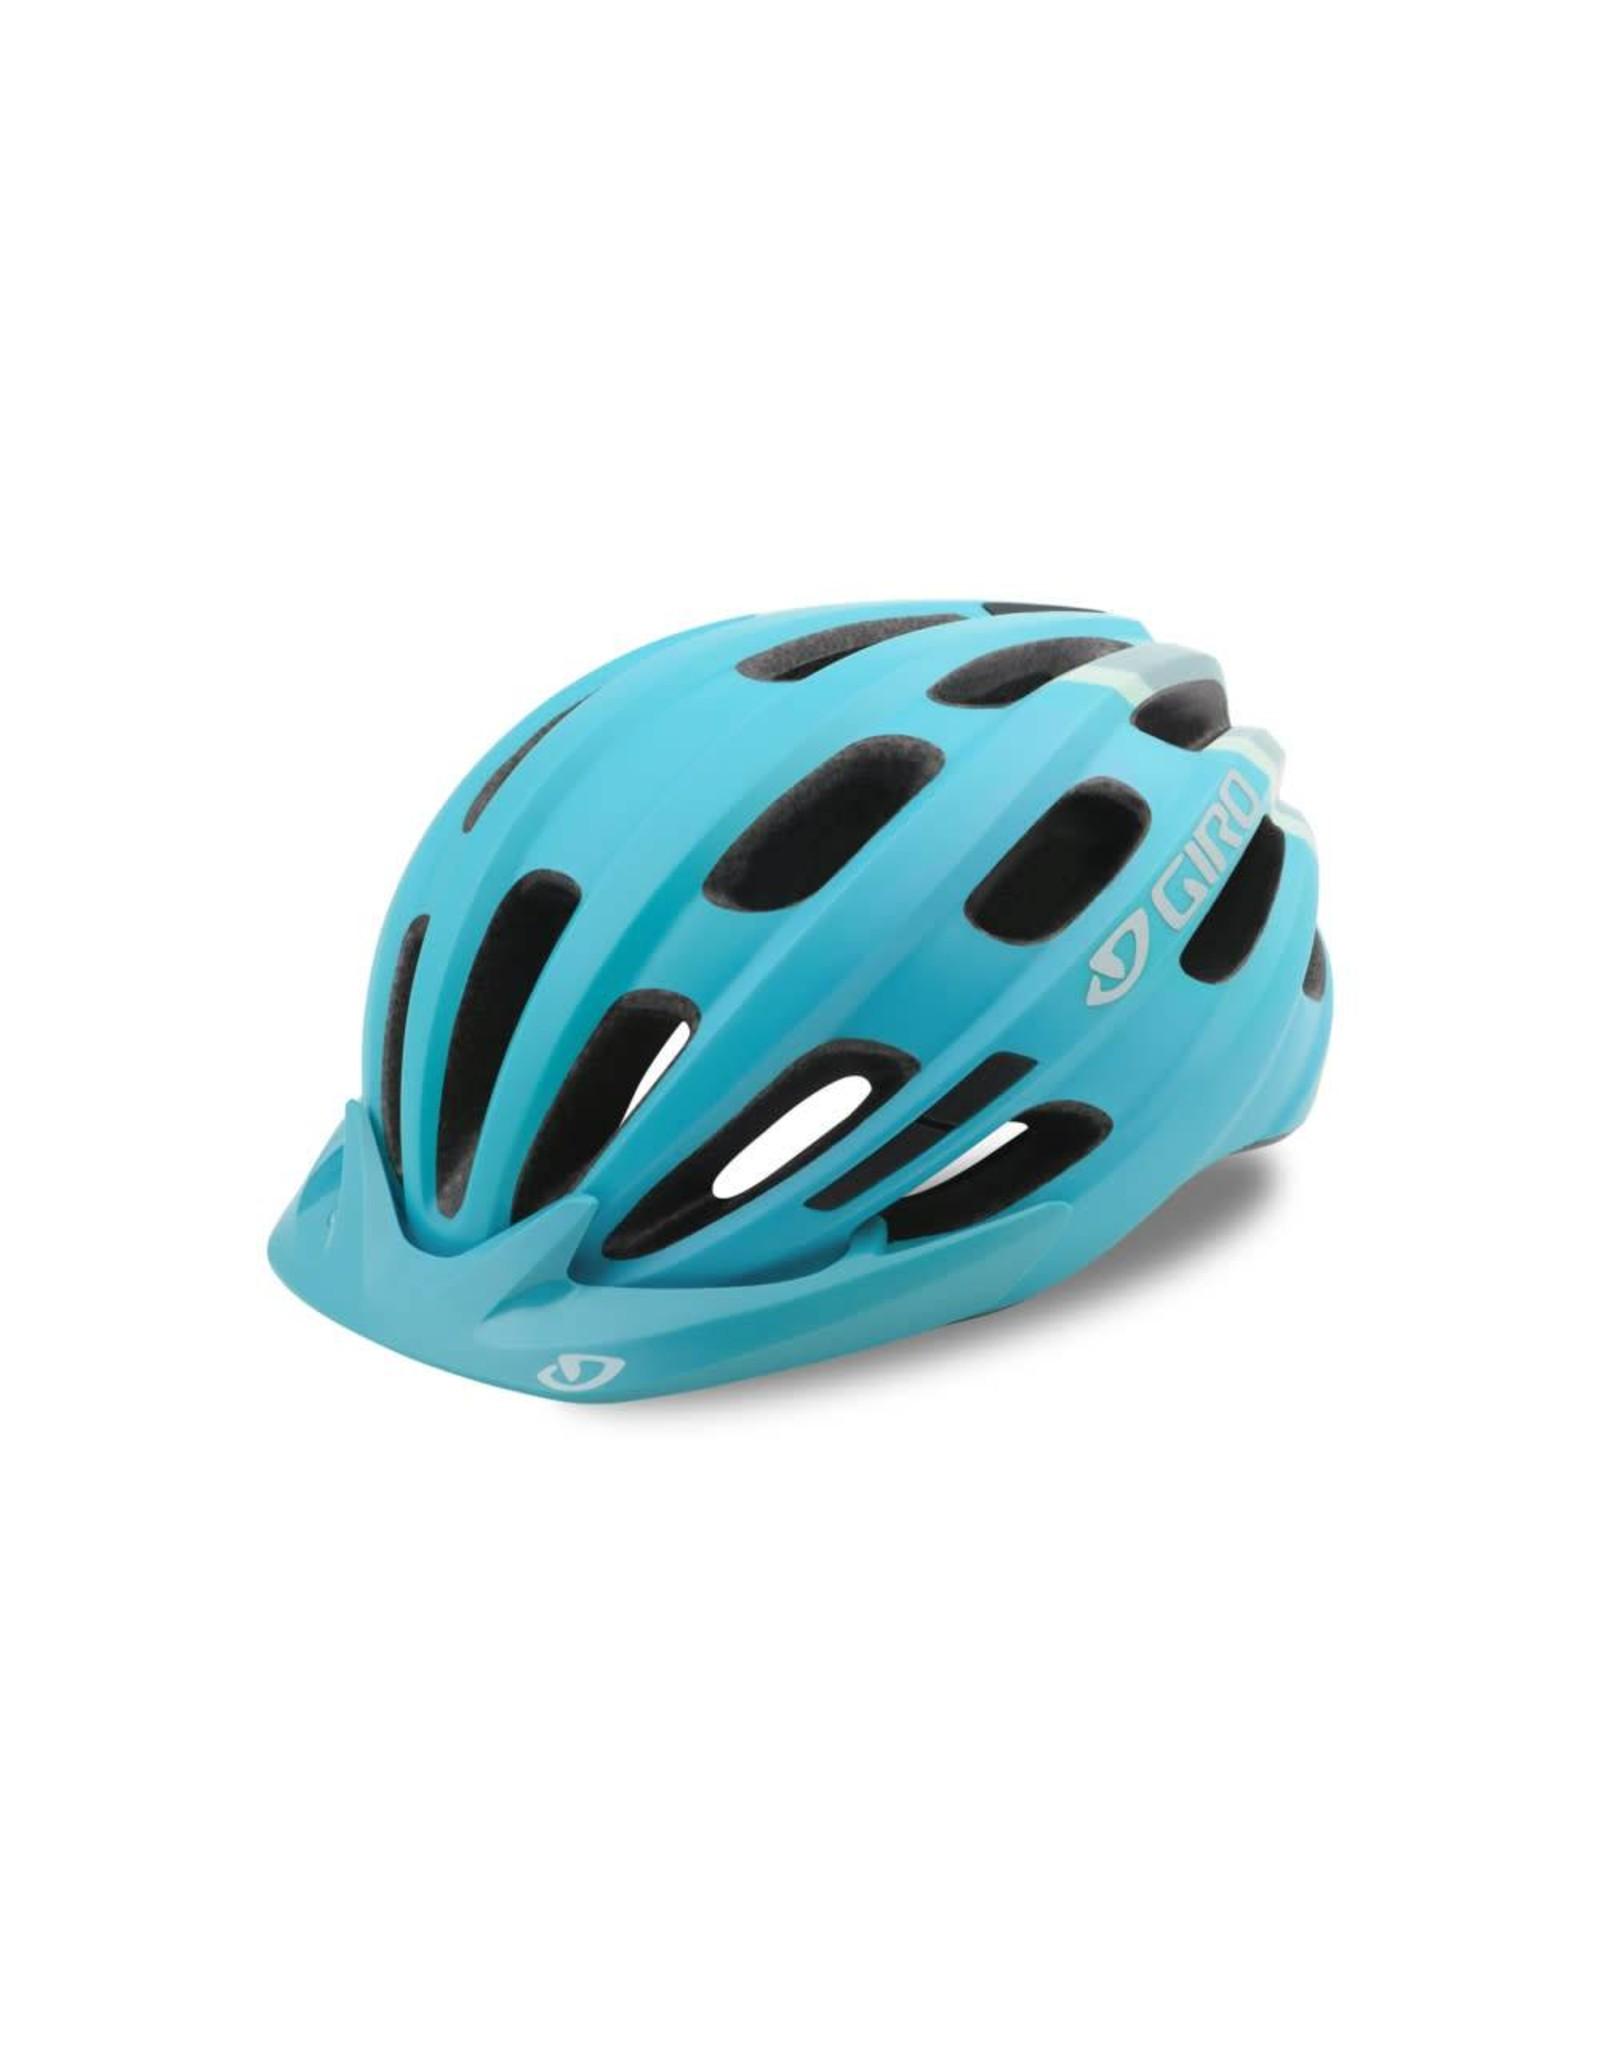 Giro Hale helmet - Universal youth size